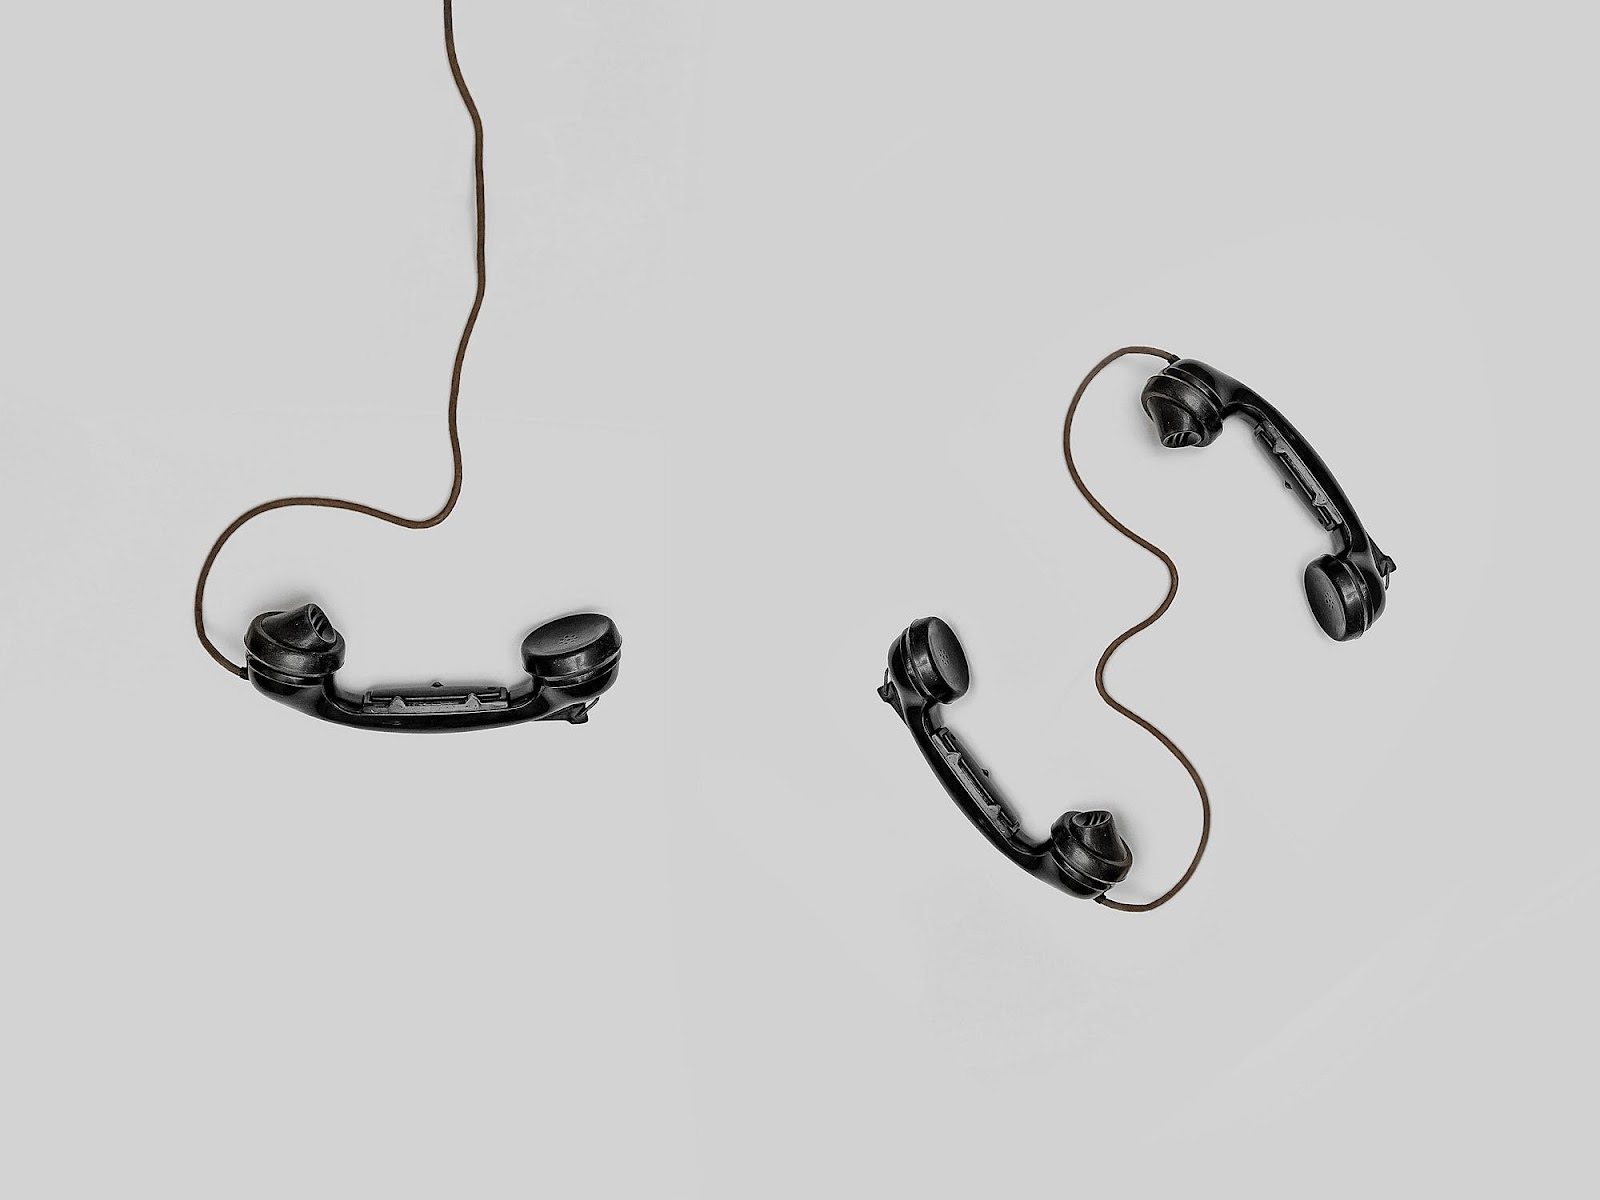 three-black-handset-toy telephones internal communications plan